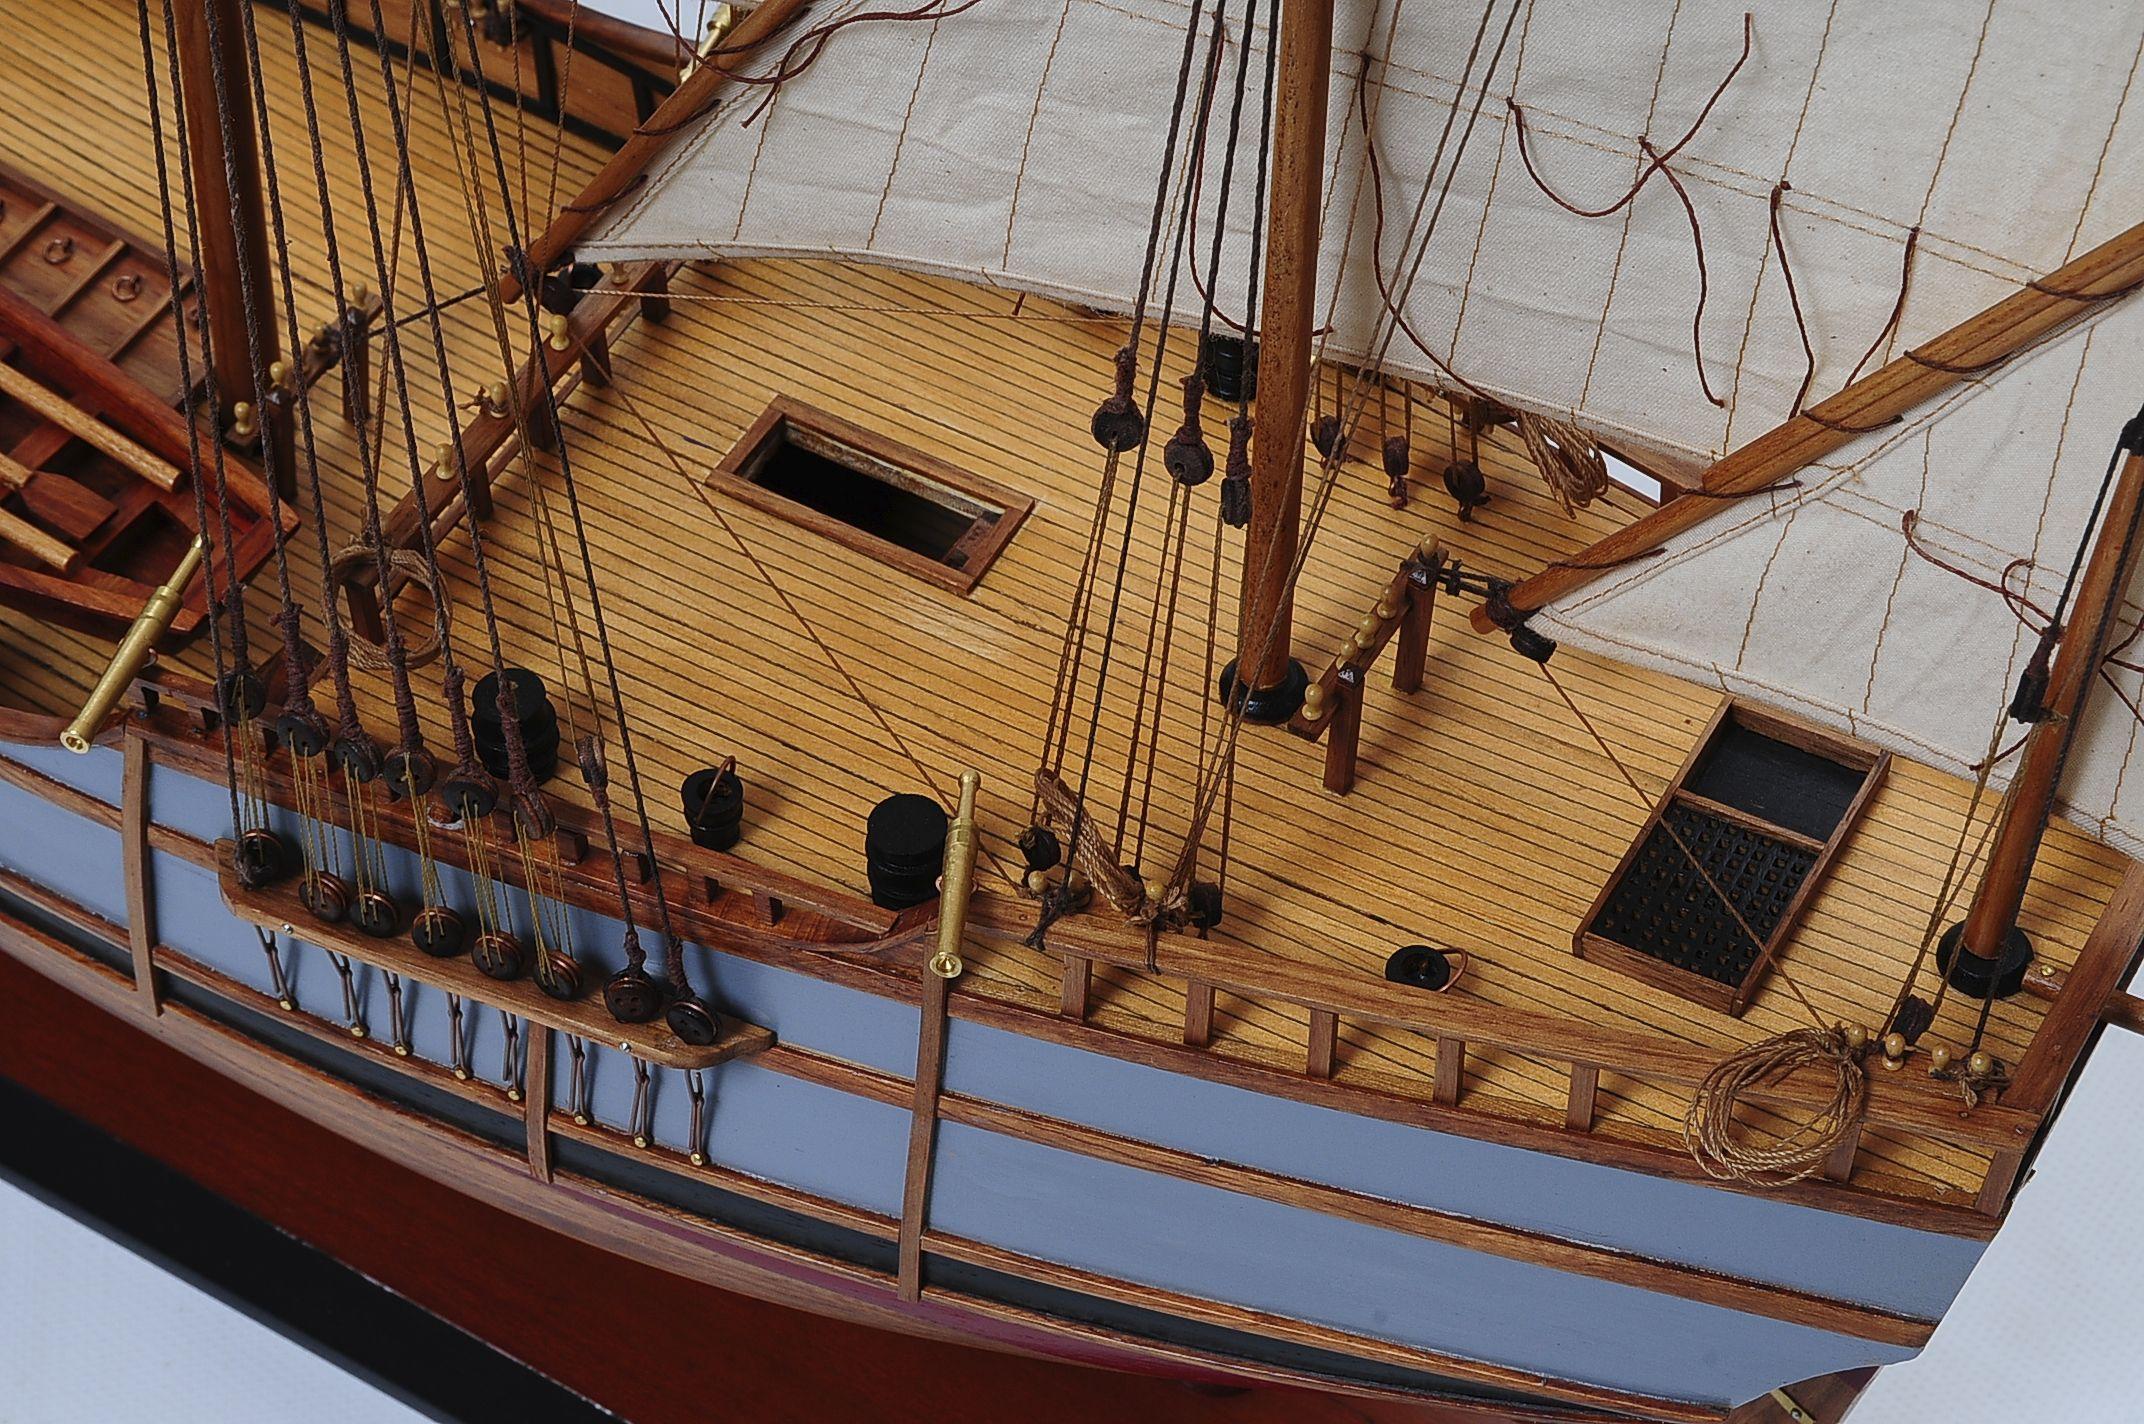 1429-6027-La-Nina-Model-Boat-Superior-Range